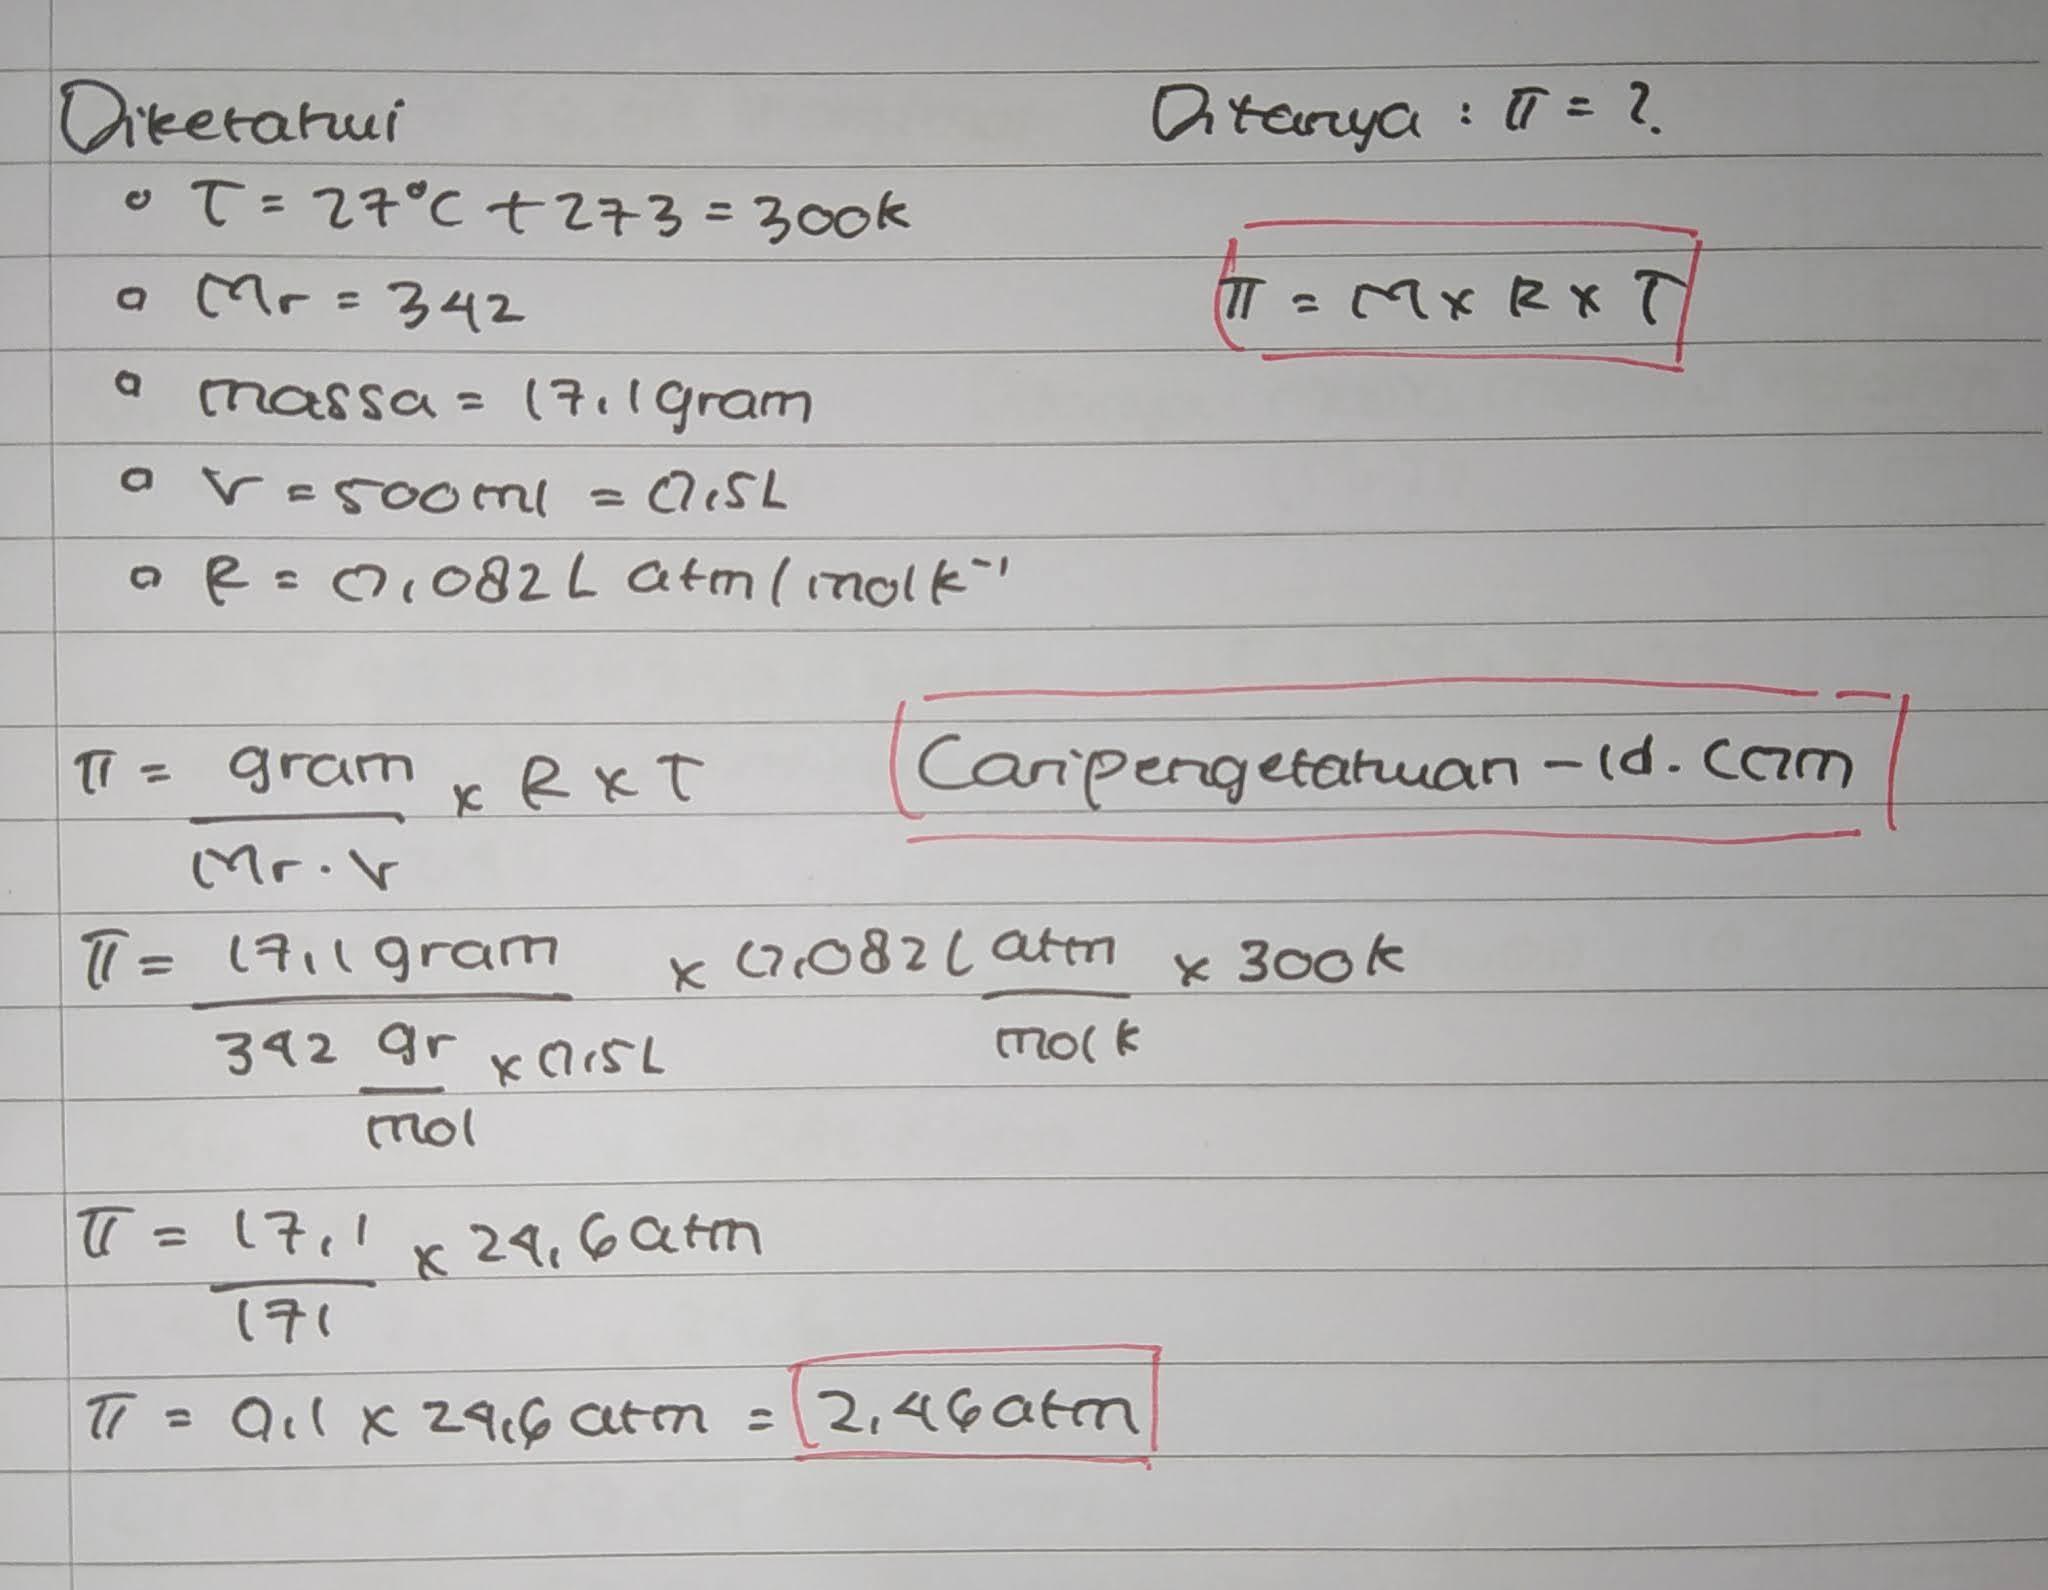 Pada suhu 27°C, sukrosa (C12H22O11) Mr = 342 gram/mol. Sebanyak 17,1 gram dilarutkan dalam air sampai mencapai volume 500 mL. jika diketahui R = 0,082 L atm/mol K-1, tekanan osmosis larutan yang terjadi adalah